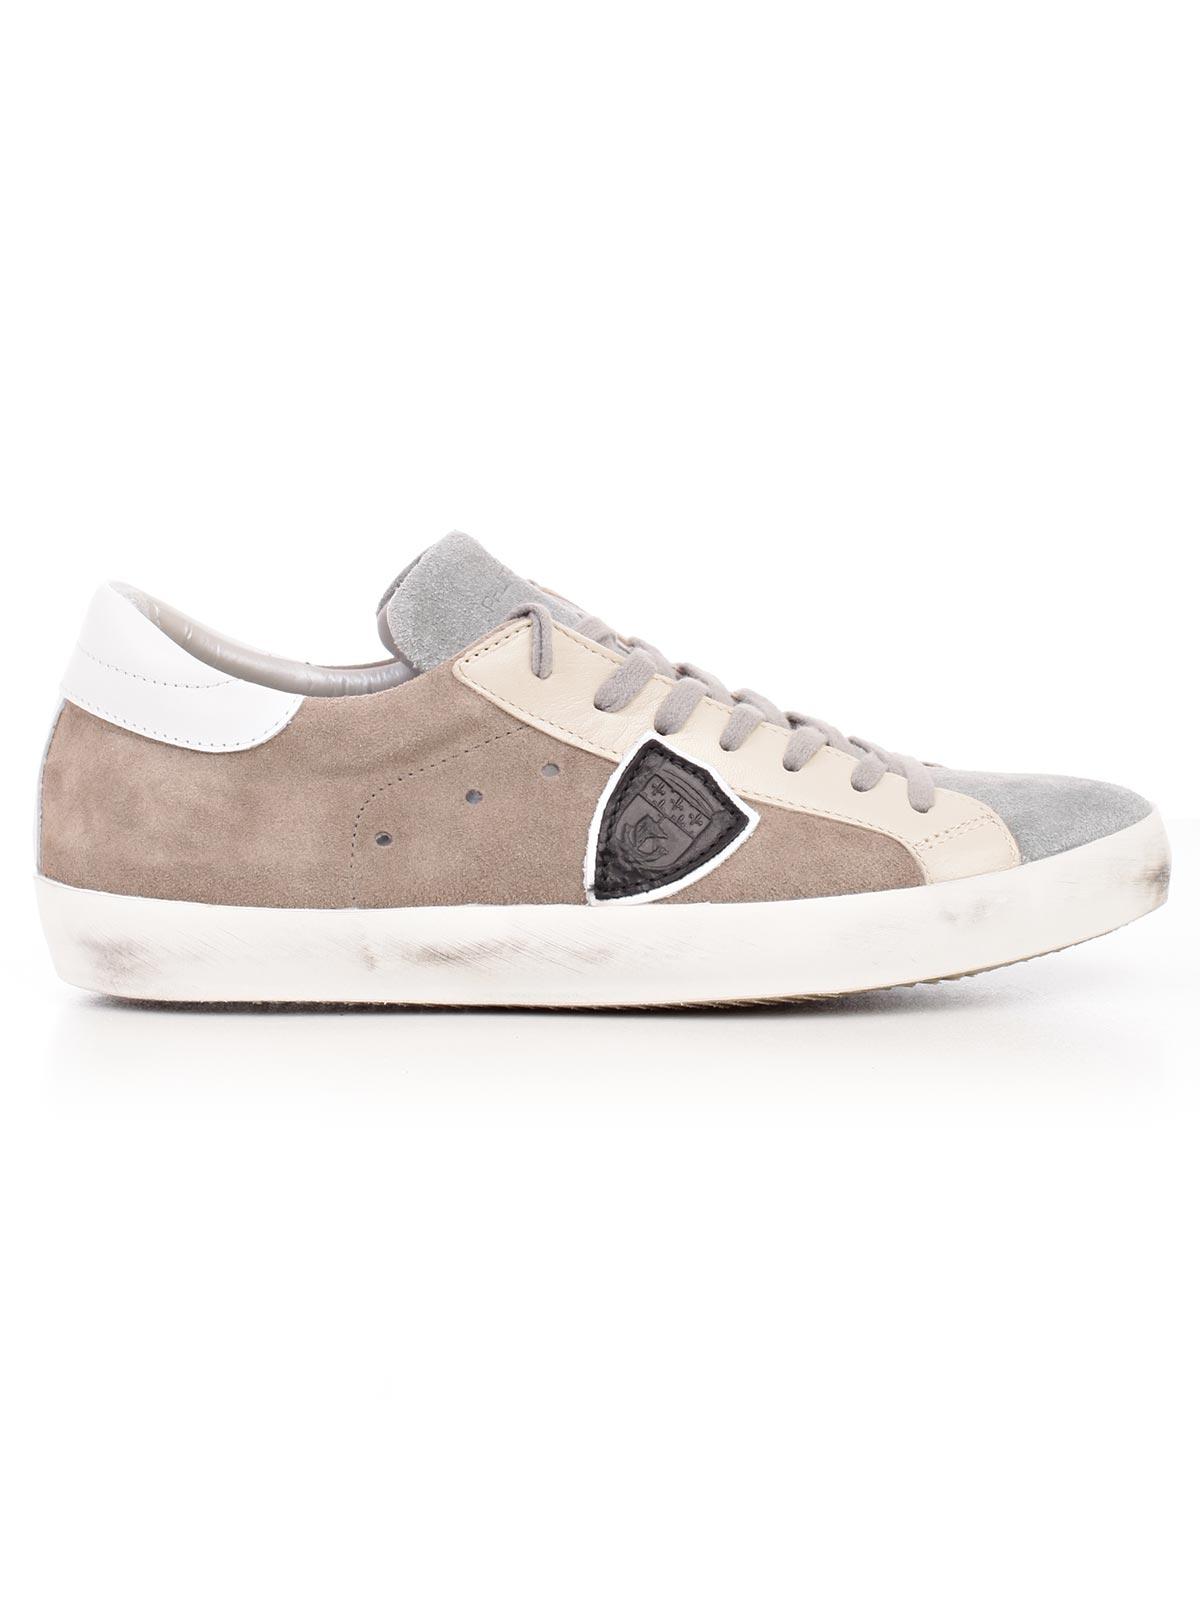 Picture of PHILIPPE MODEL FOOTWEAR SCARPA CLASSIC BASSA